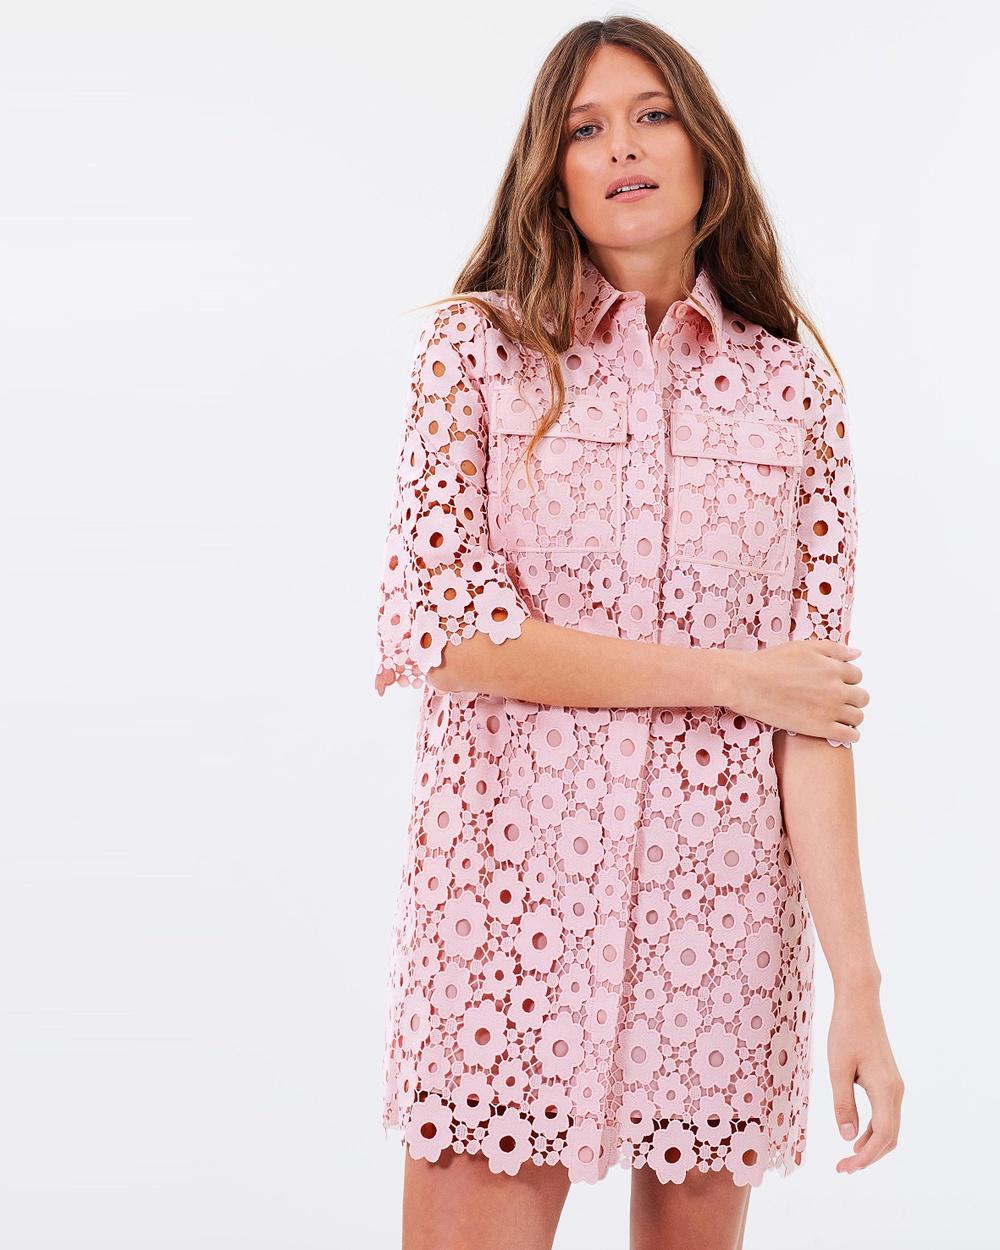 Whistles Lia Daisy Lace Dress Dresses Pale Pink Lia Daisy Lace Dress